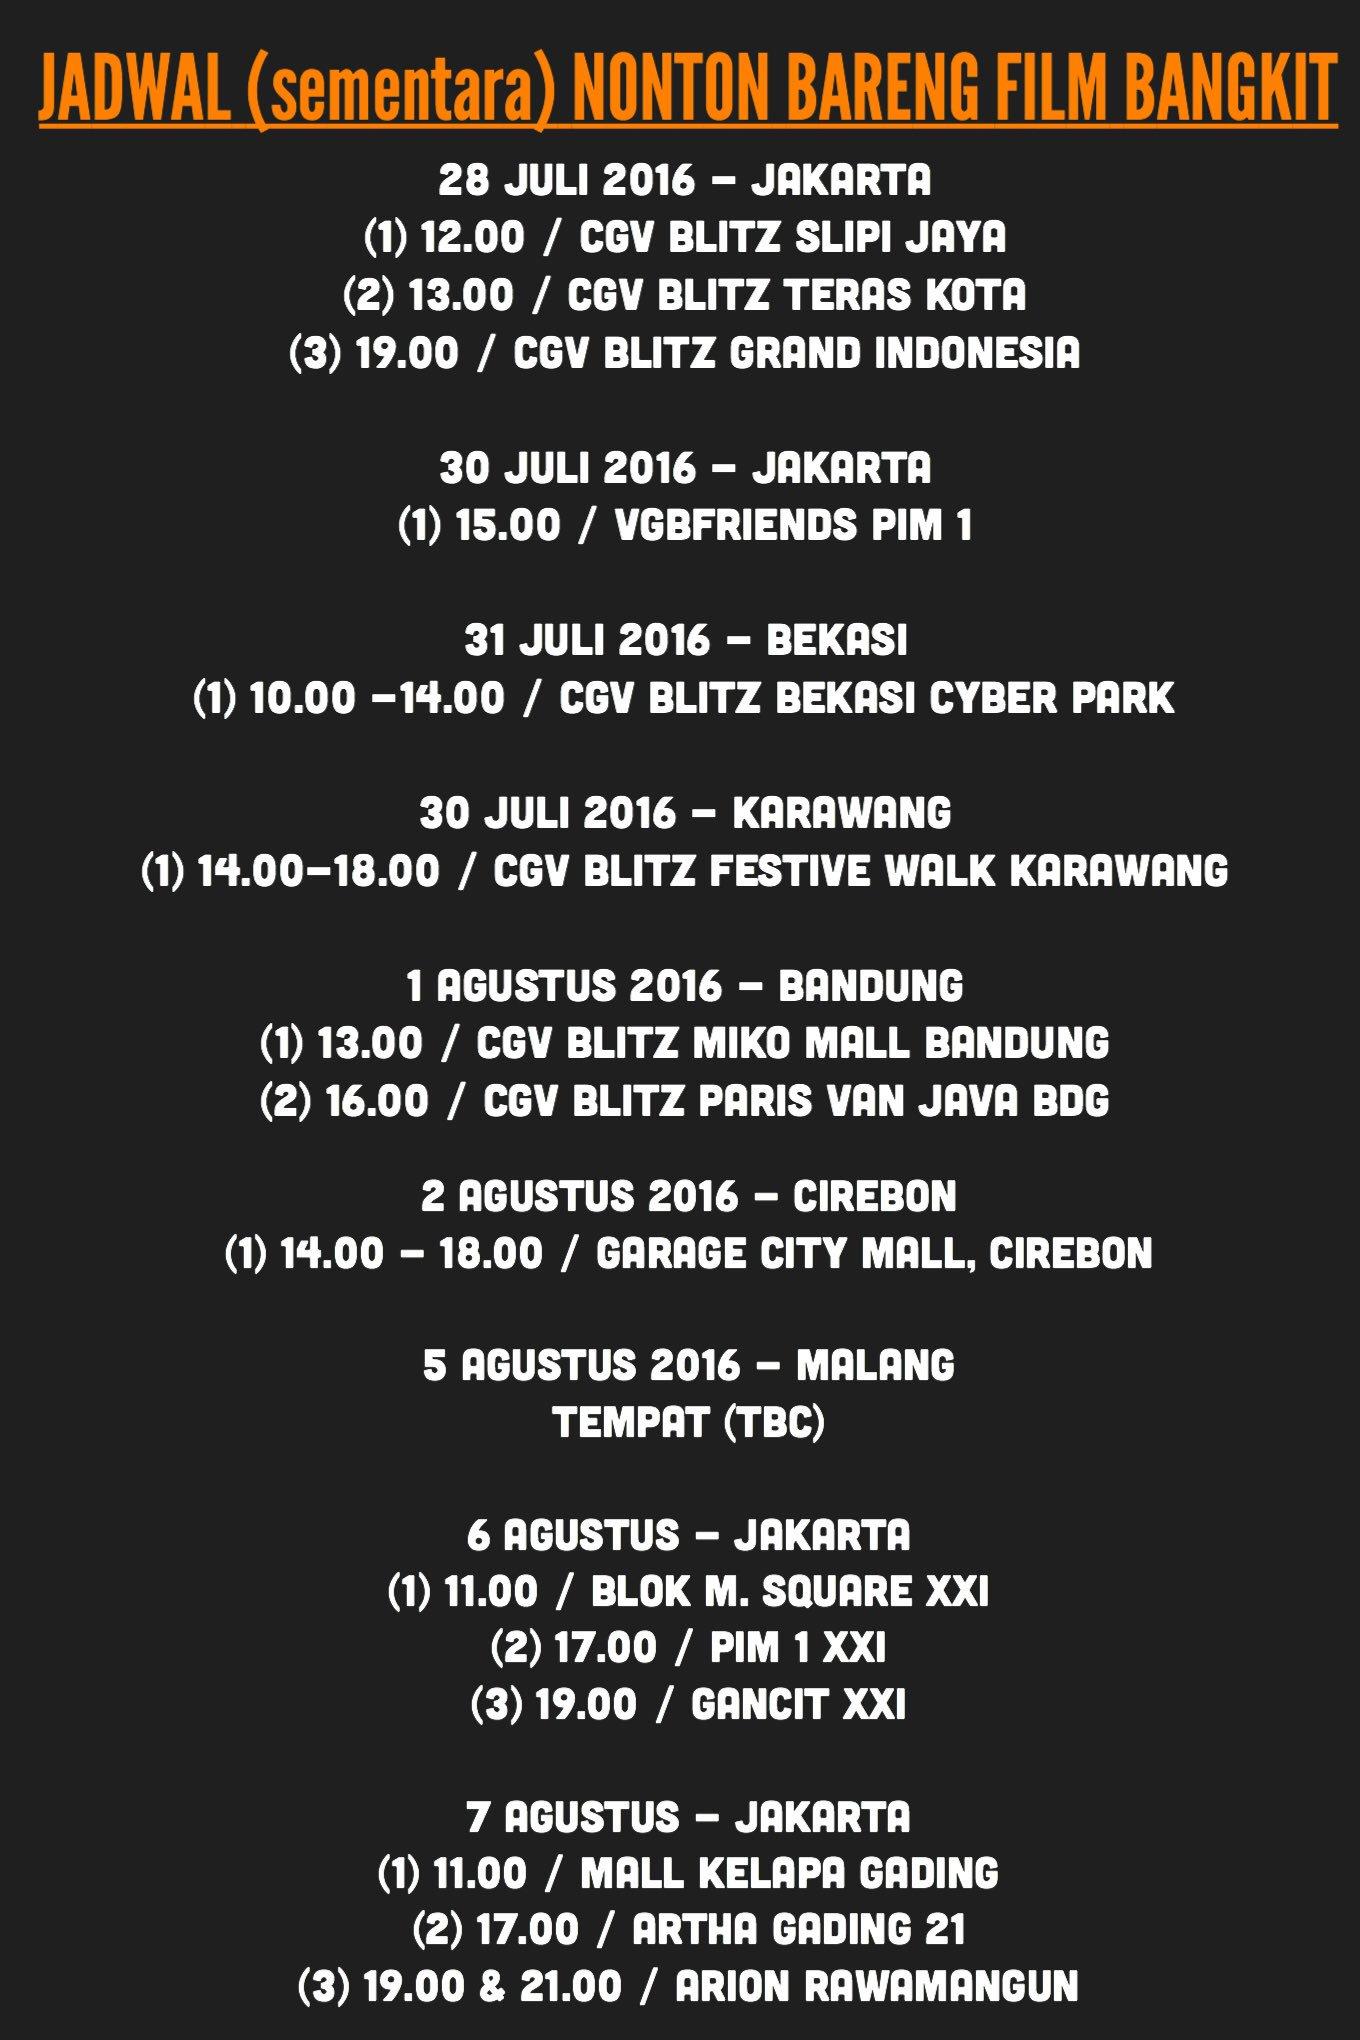 Jadwal Blitz Cirebon : jadwal, blitz, cirebon, G.Bastian, Twitter:,